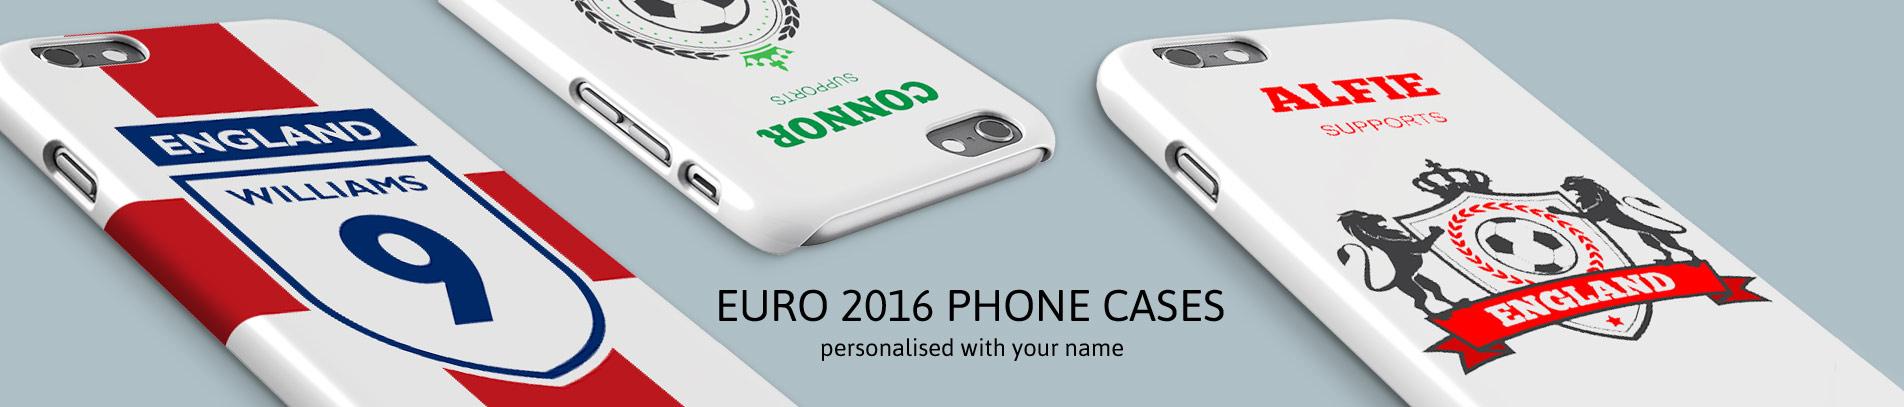 euro 2016 phone case